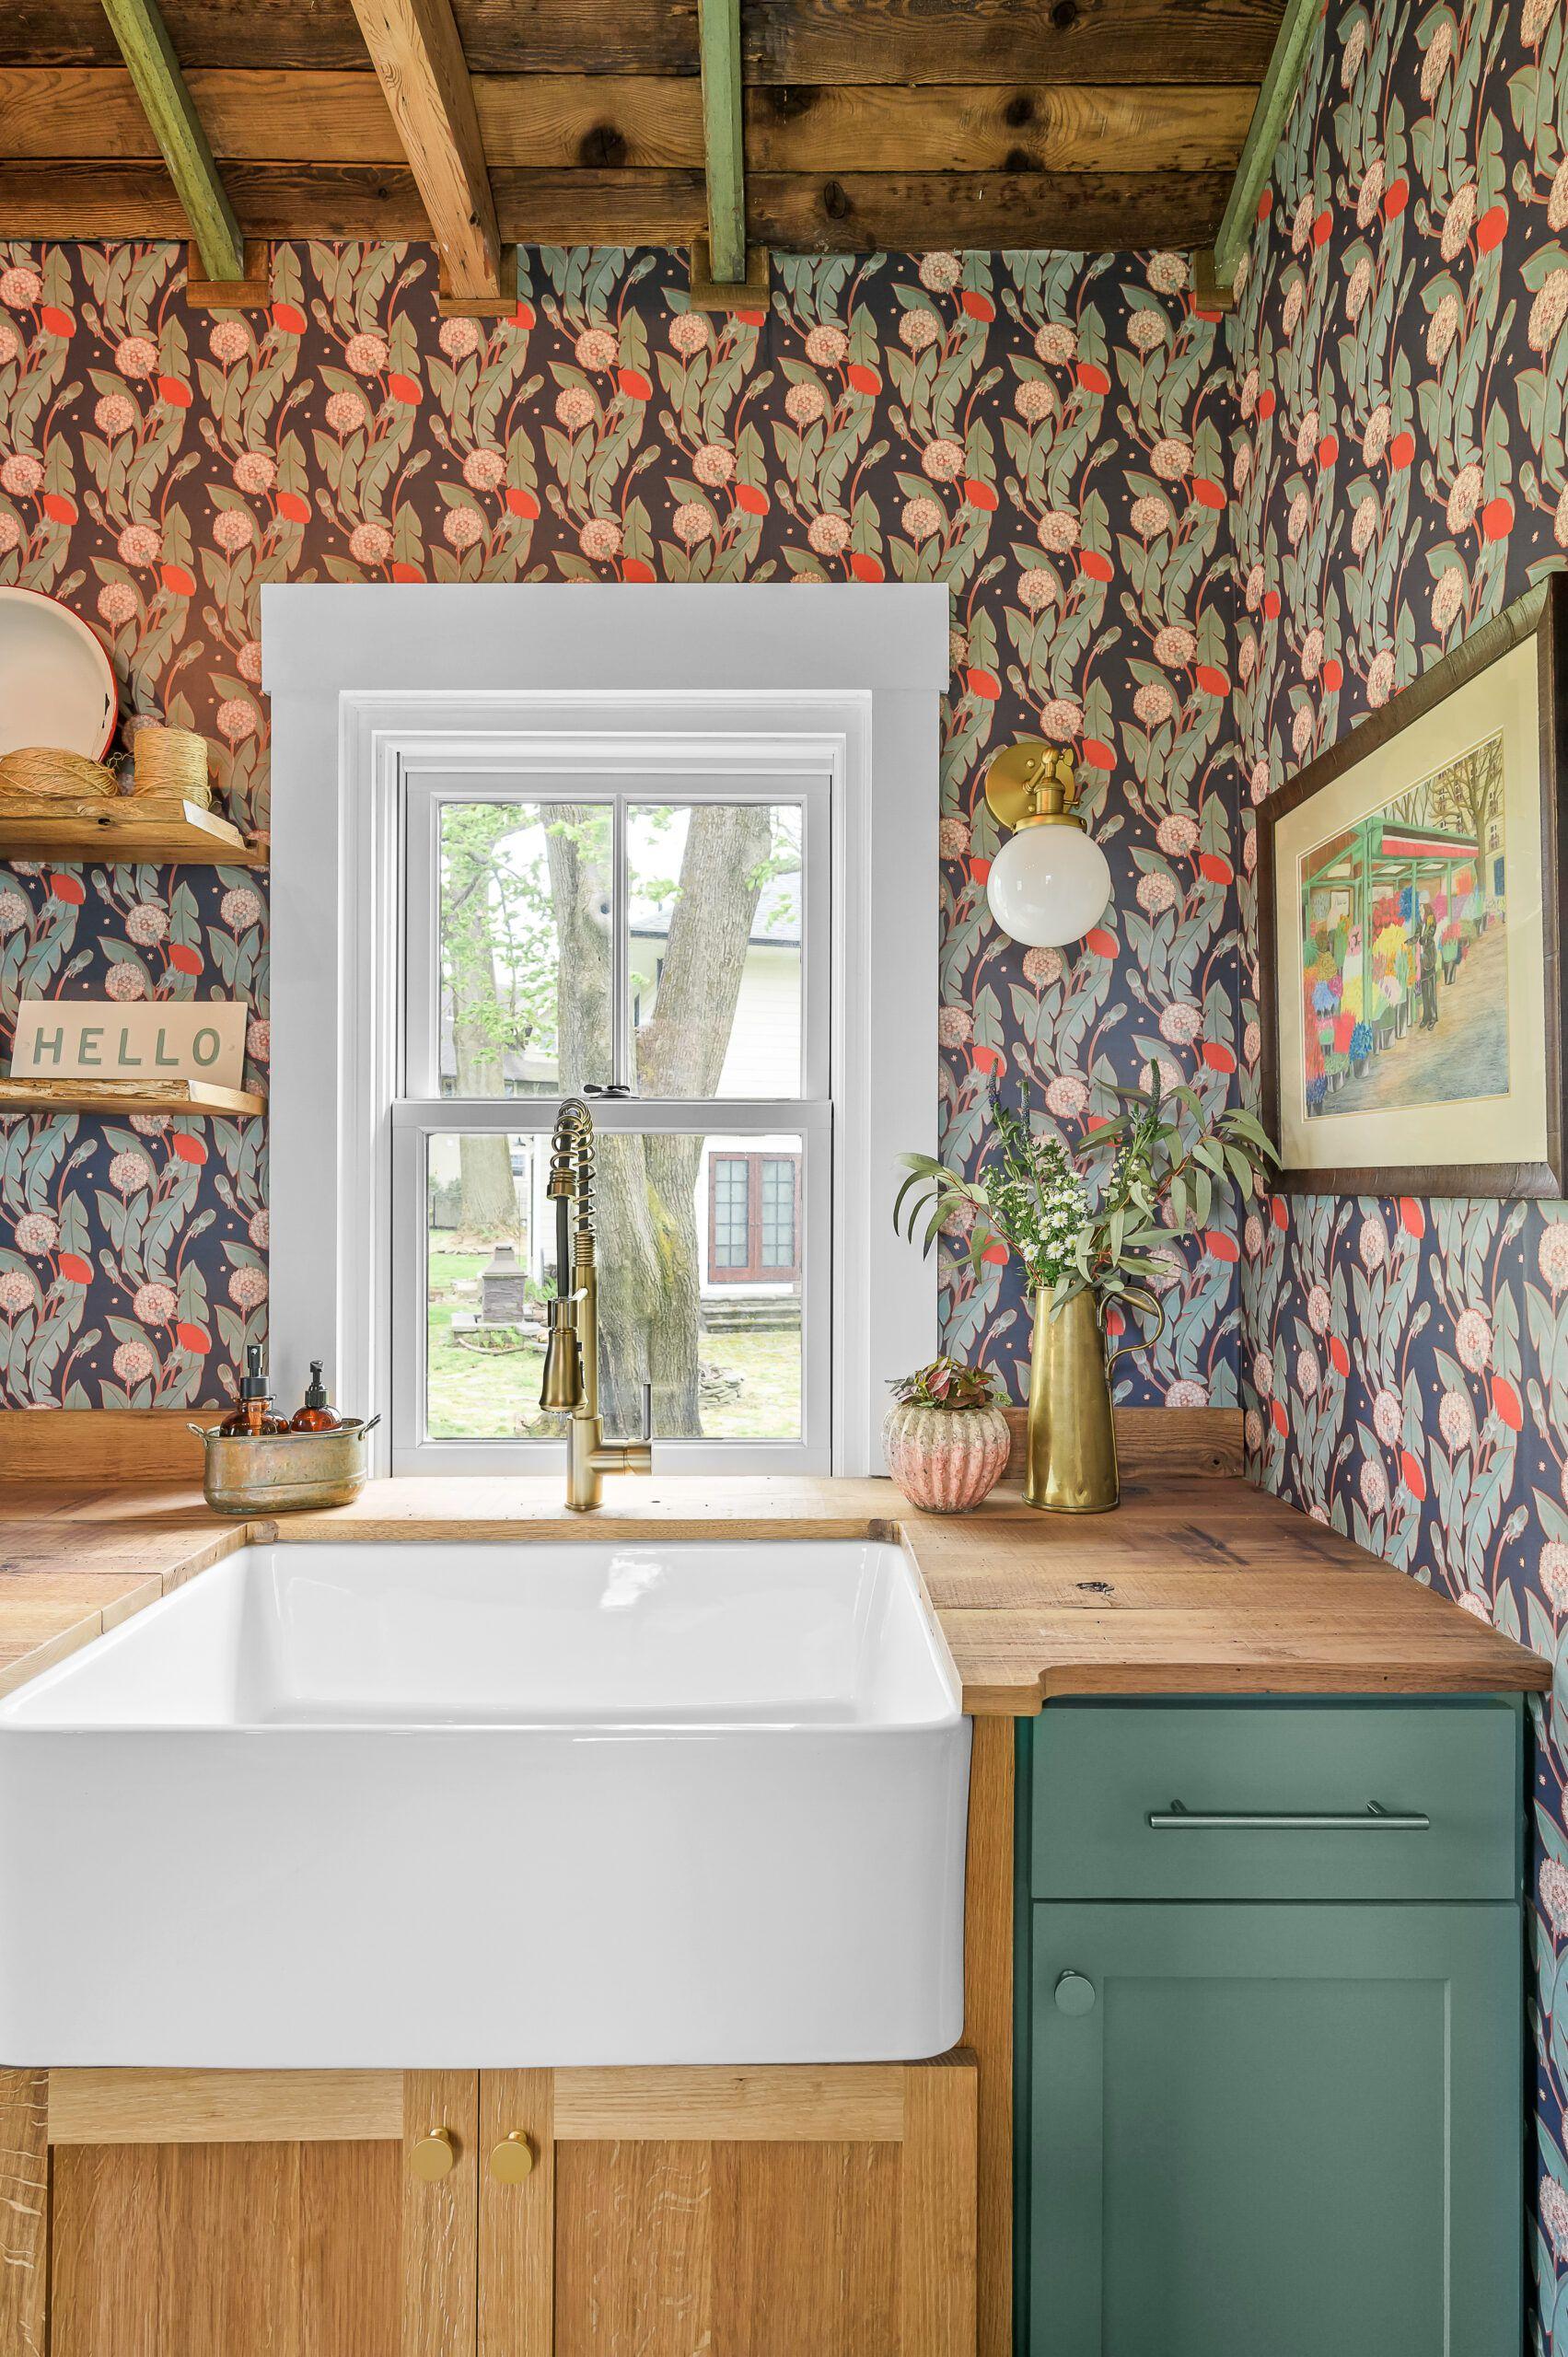 Dandelion Wallpaper by Yorklyn Home